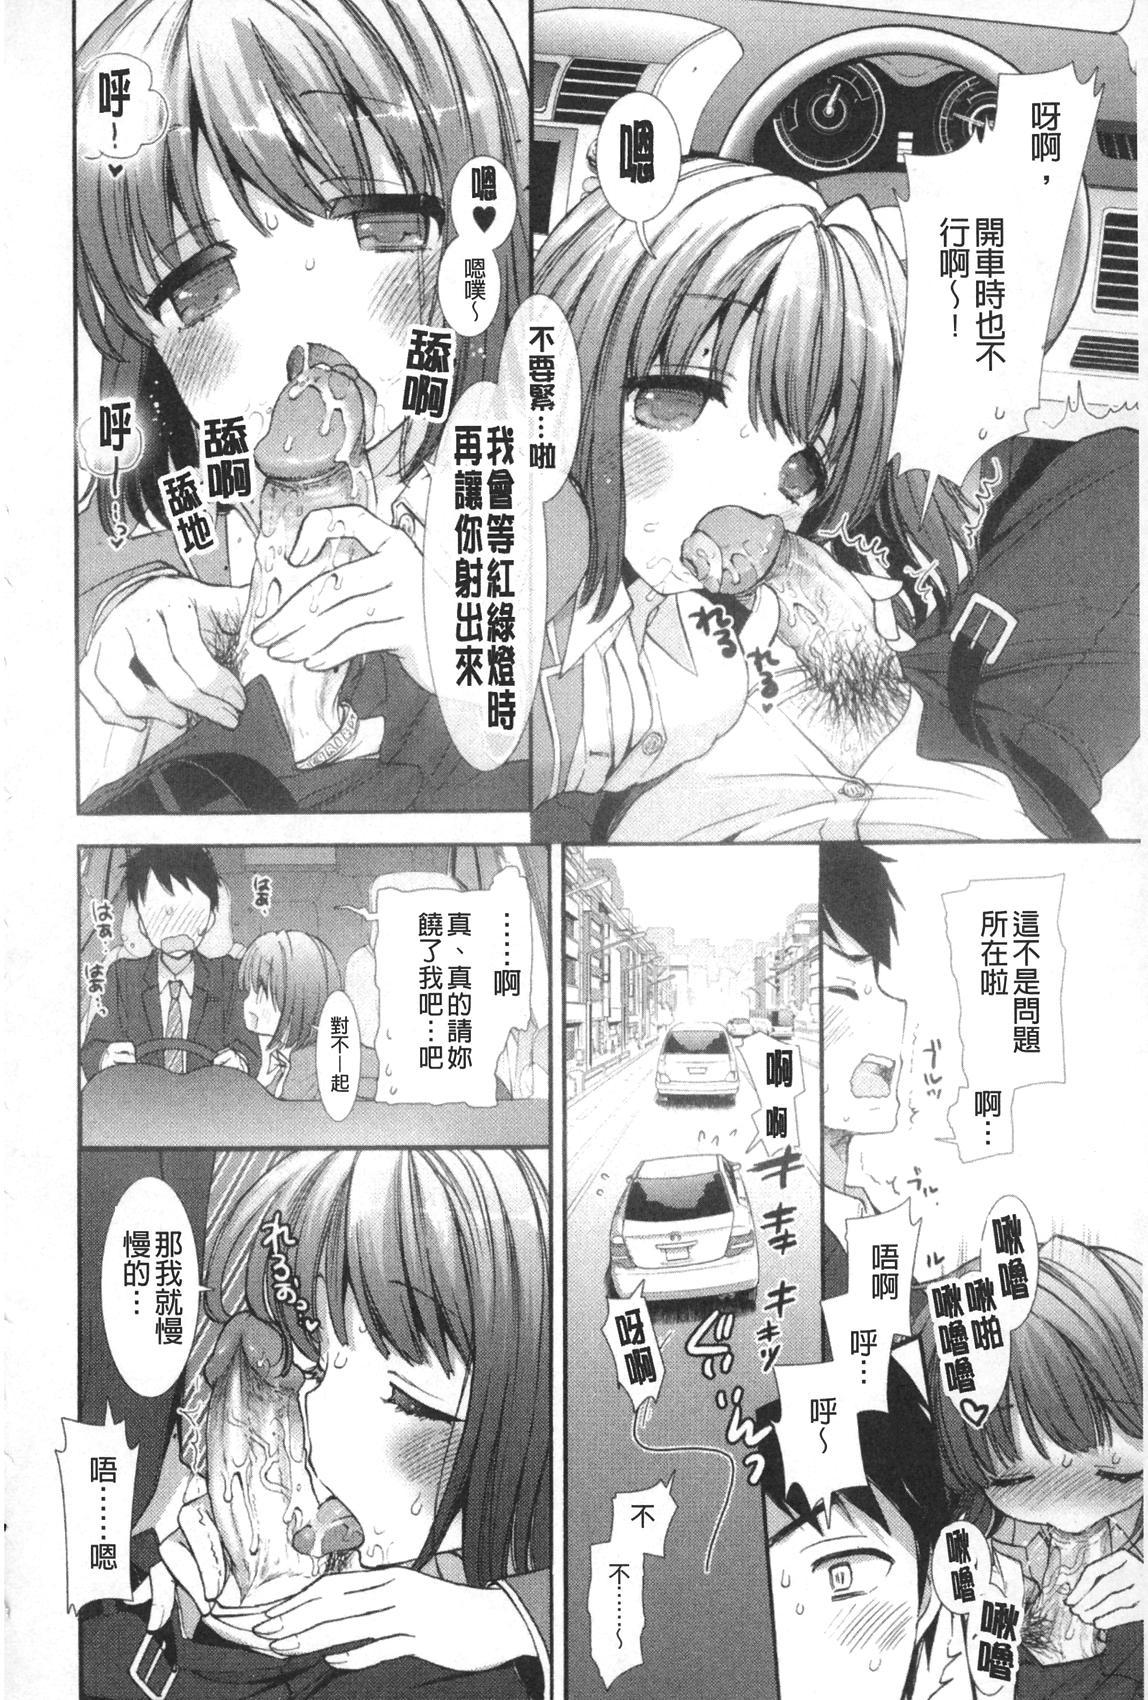 Icha Love! | 稚嫩女之愛! 20